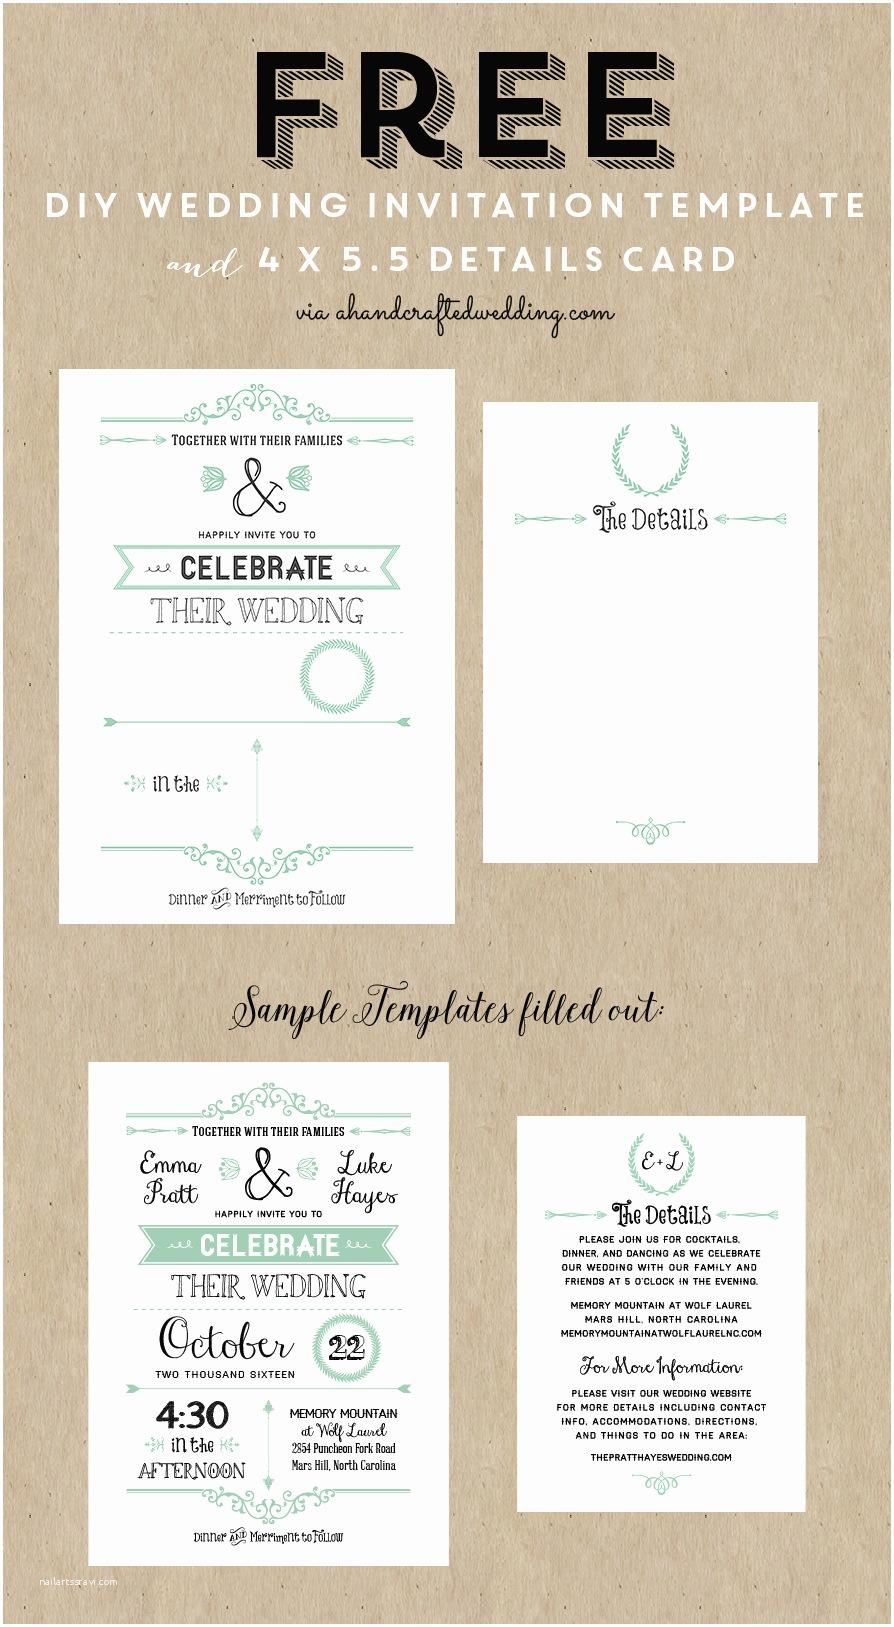 Downloadable Wedding Invitations Amazing Diy Printable Wedding Invitations to Inspire You